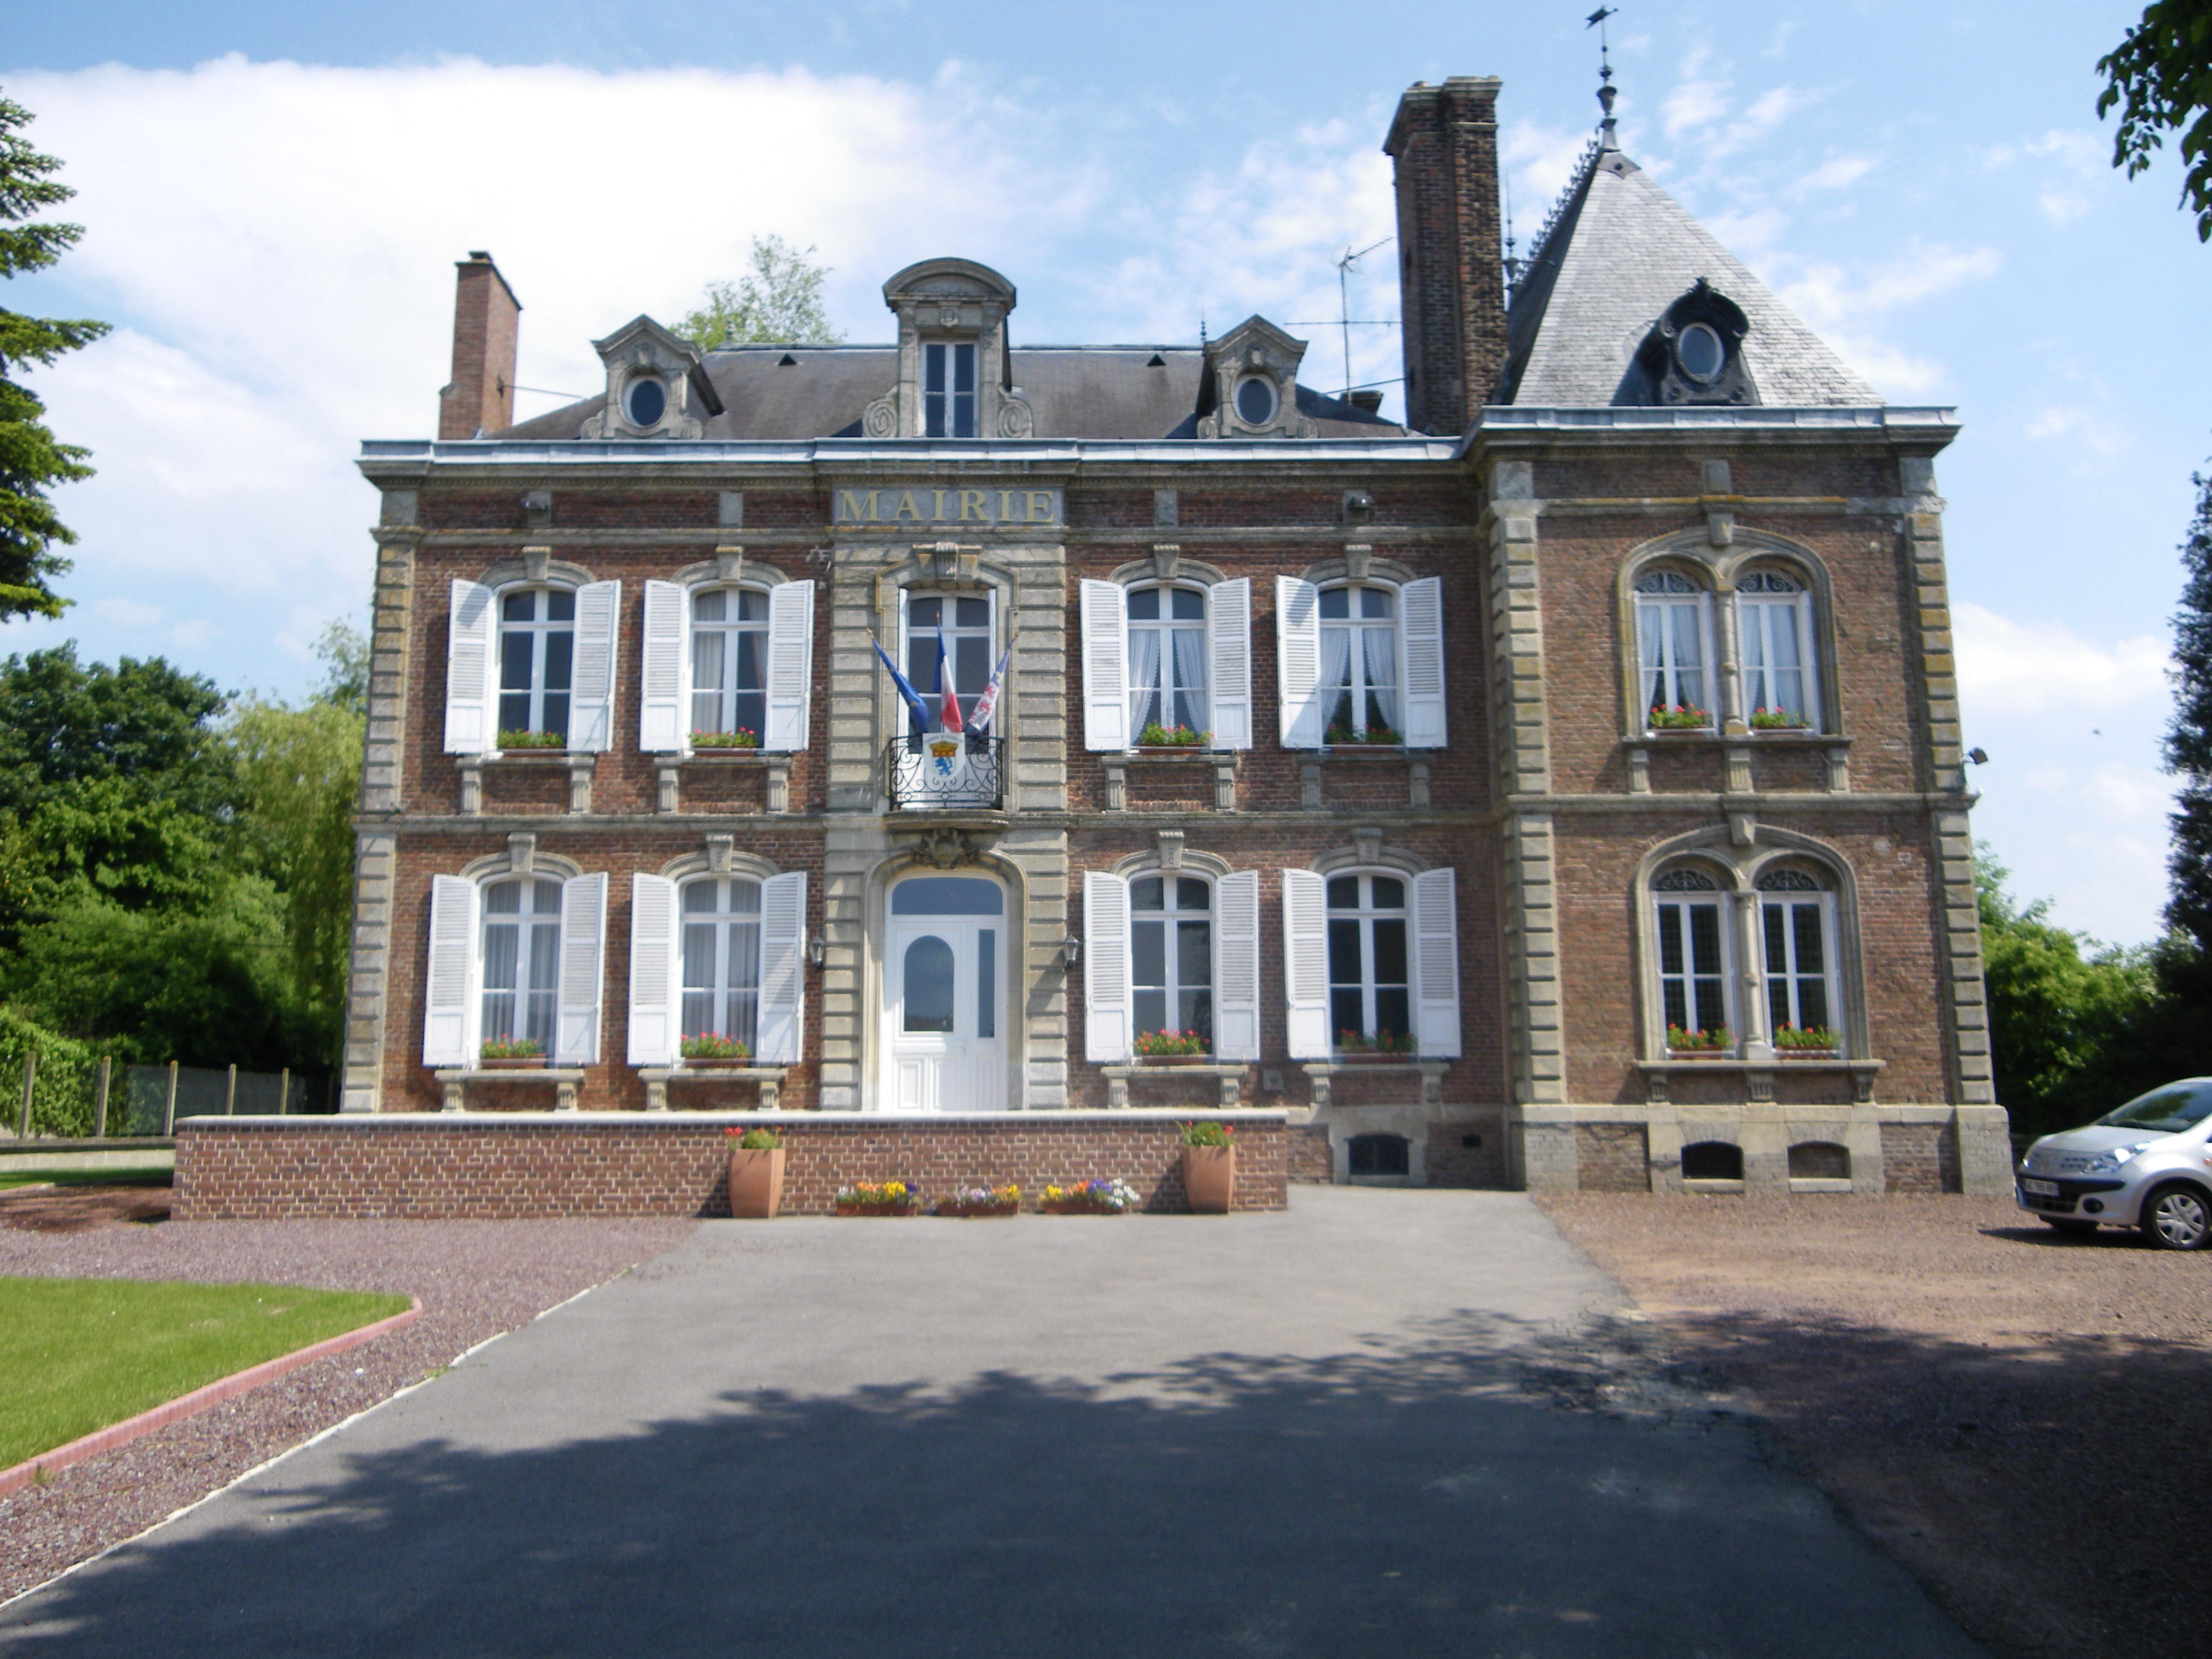 mairie-jpg